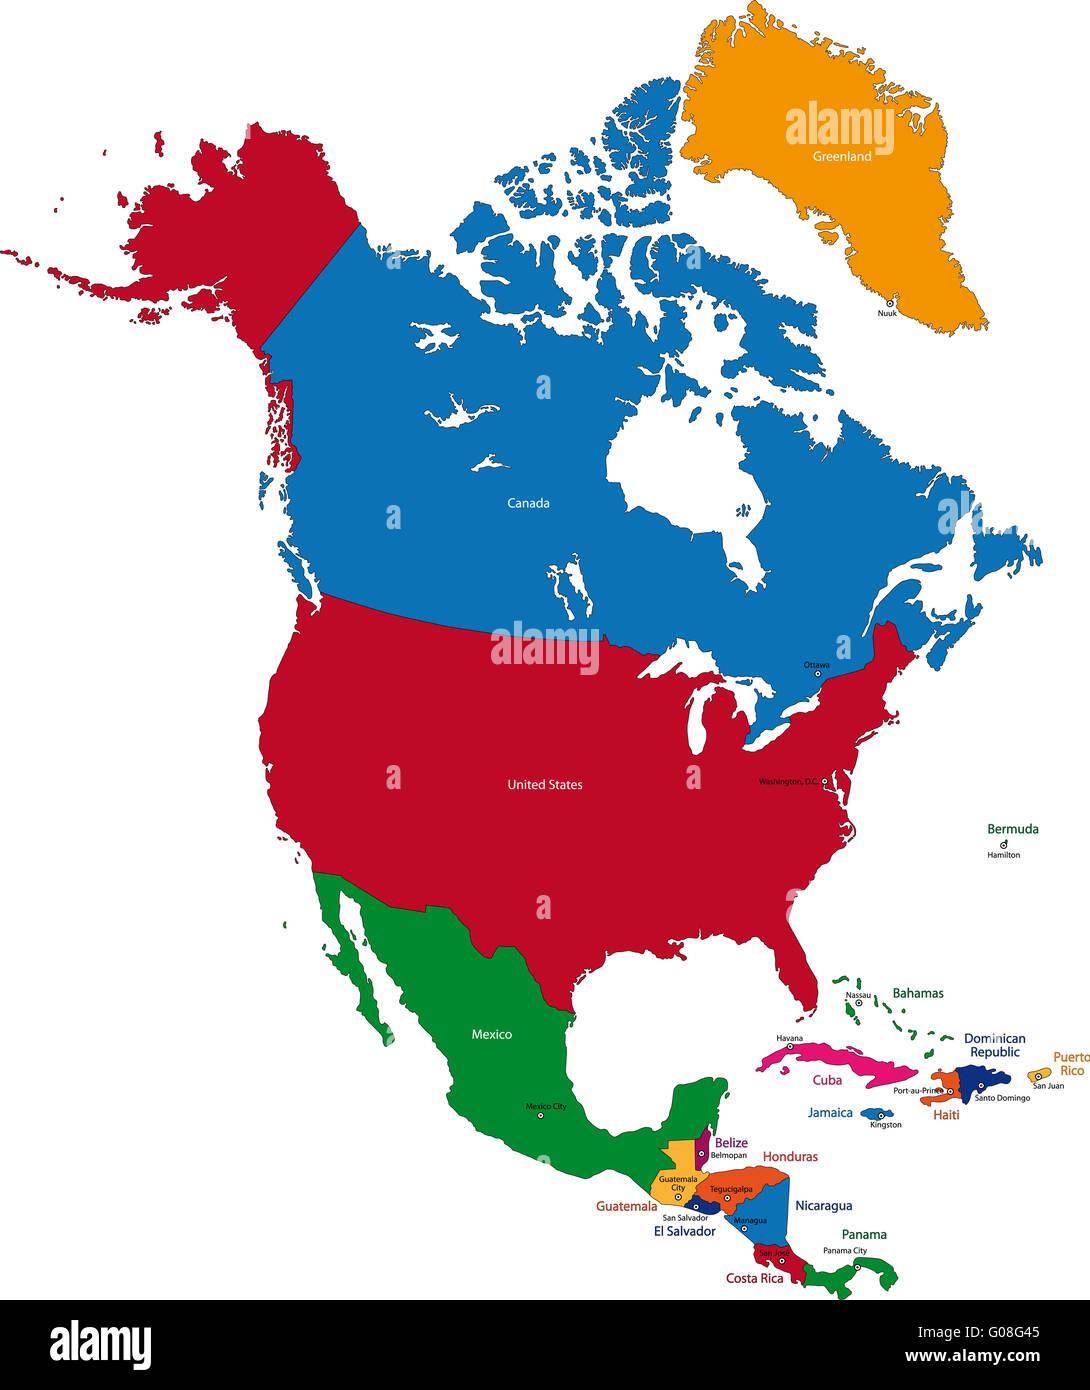 North America Map Stock Photo Royalty Free Image Alamy - North america map el salvador